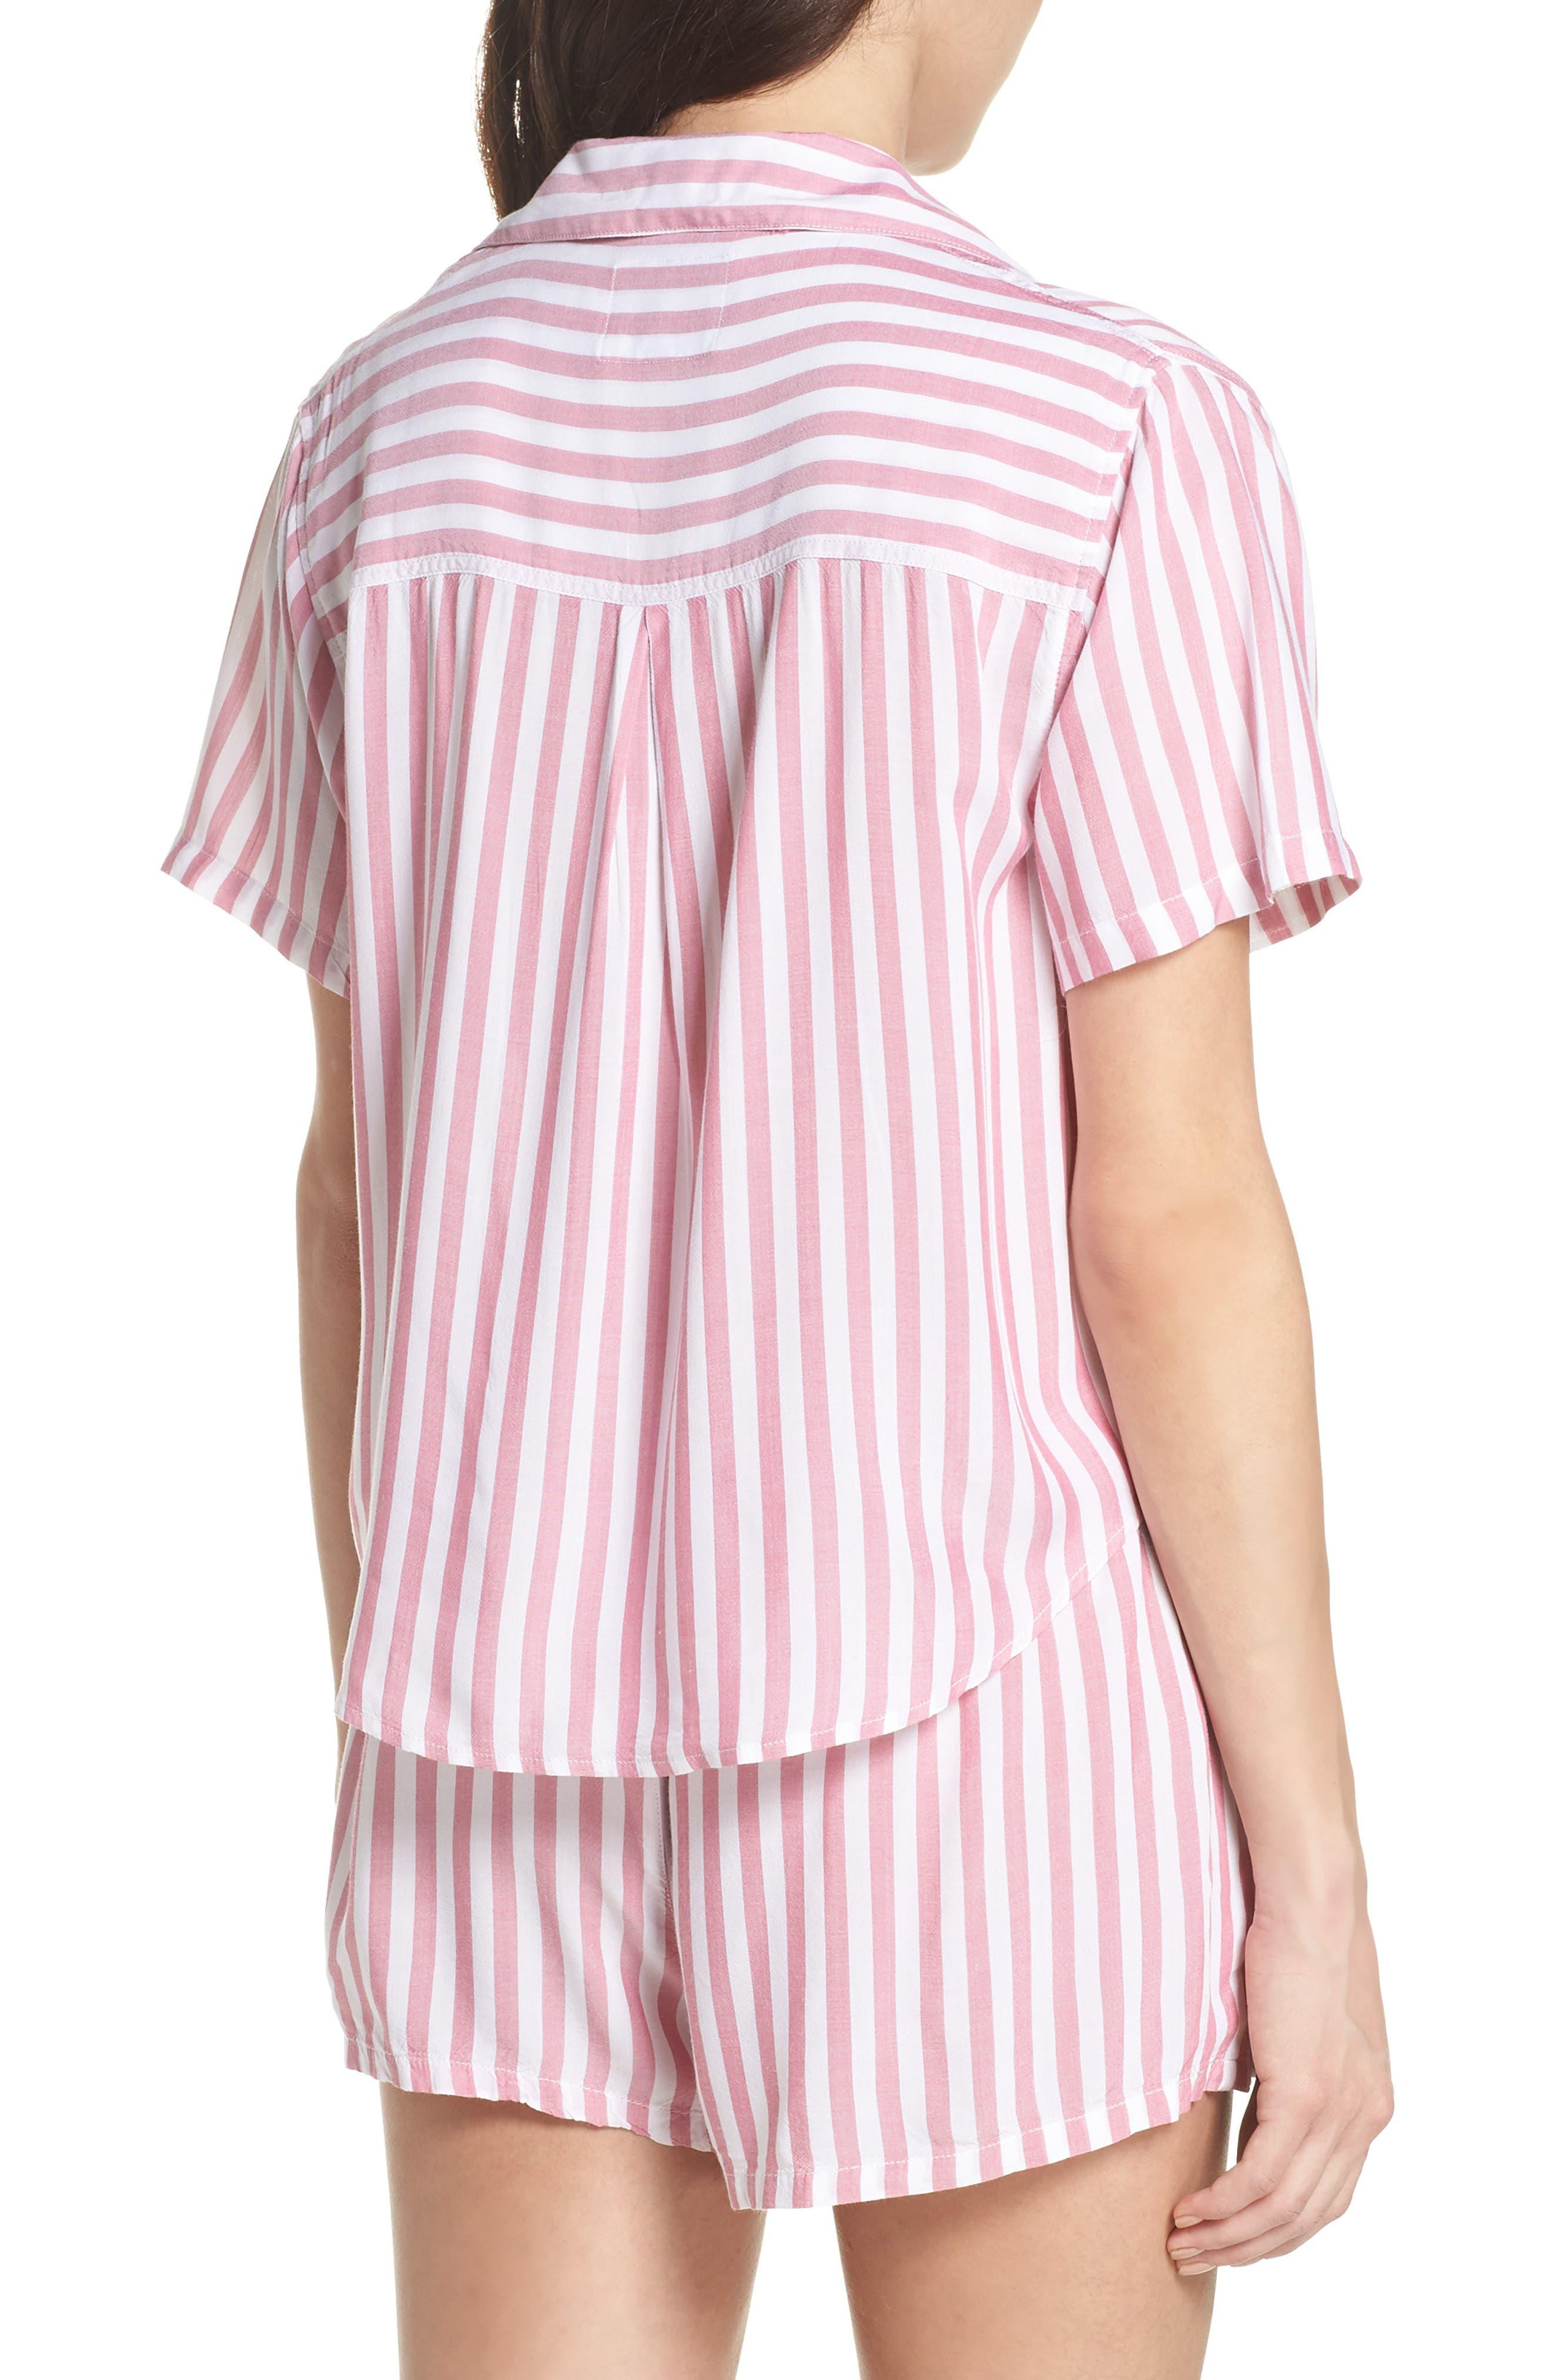 Stripe Short Pajamas,                             Alternate thumbnail 2, color,                             Garnet White